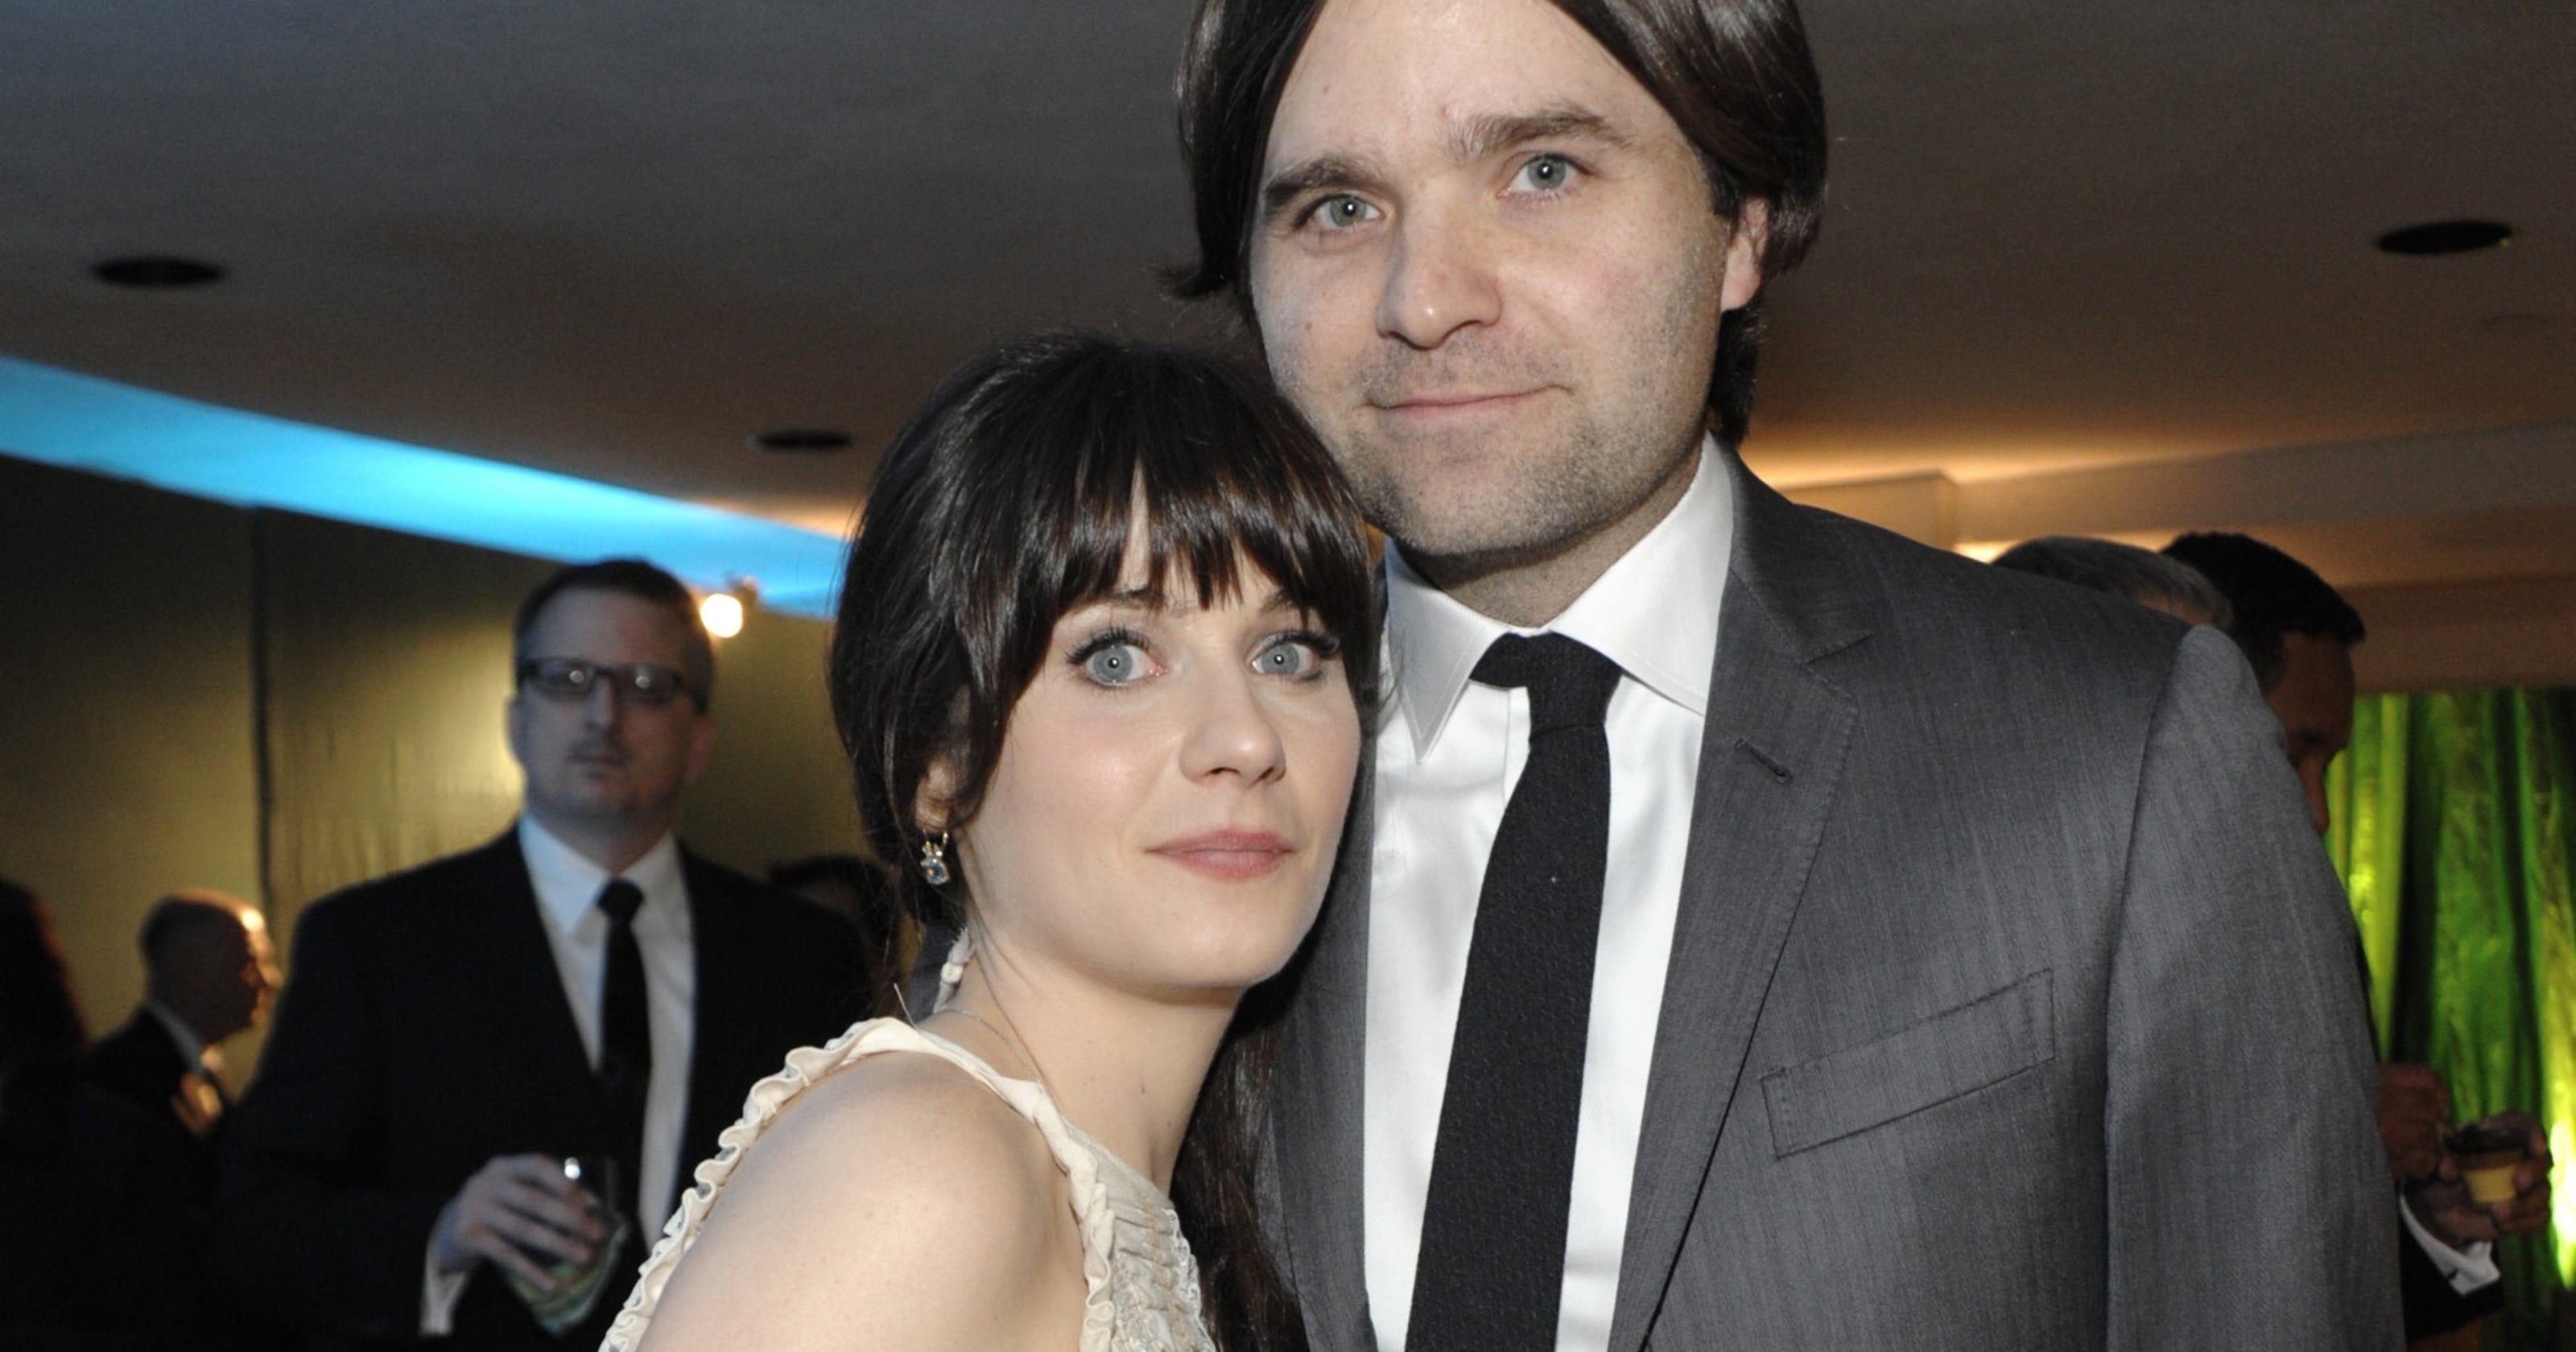 Zooey Deschanel and rocker husband are officially divorced